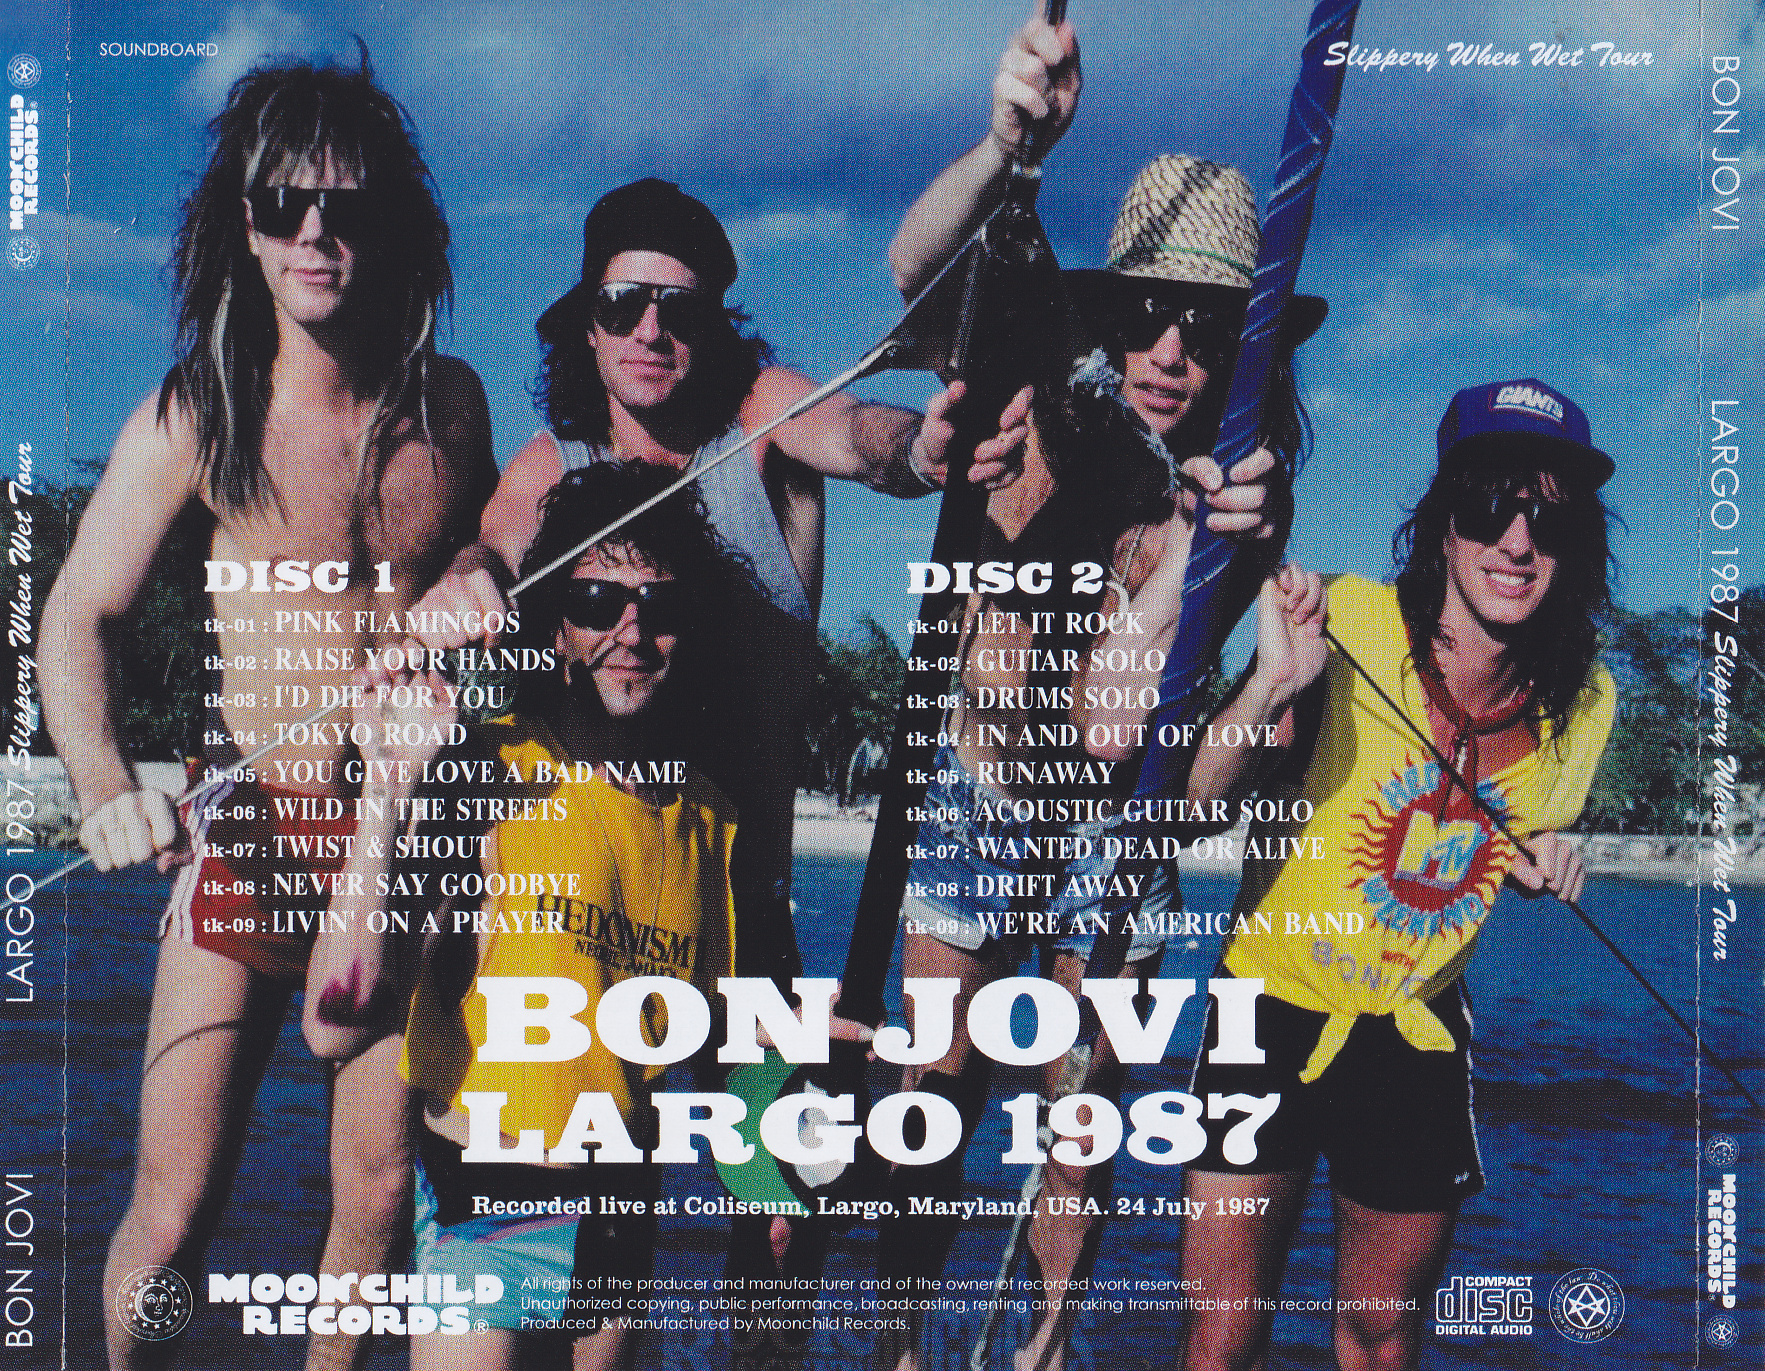 Bon Jovi / Largo 1987 / 2CD – GiGinJapan